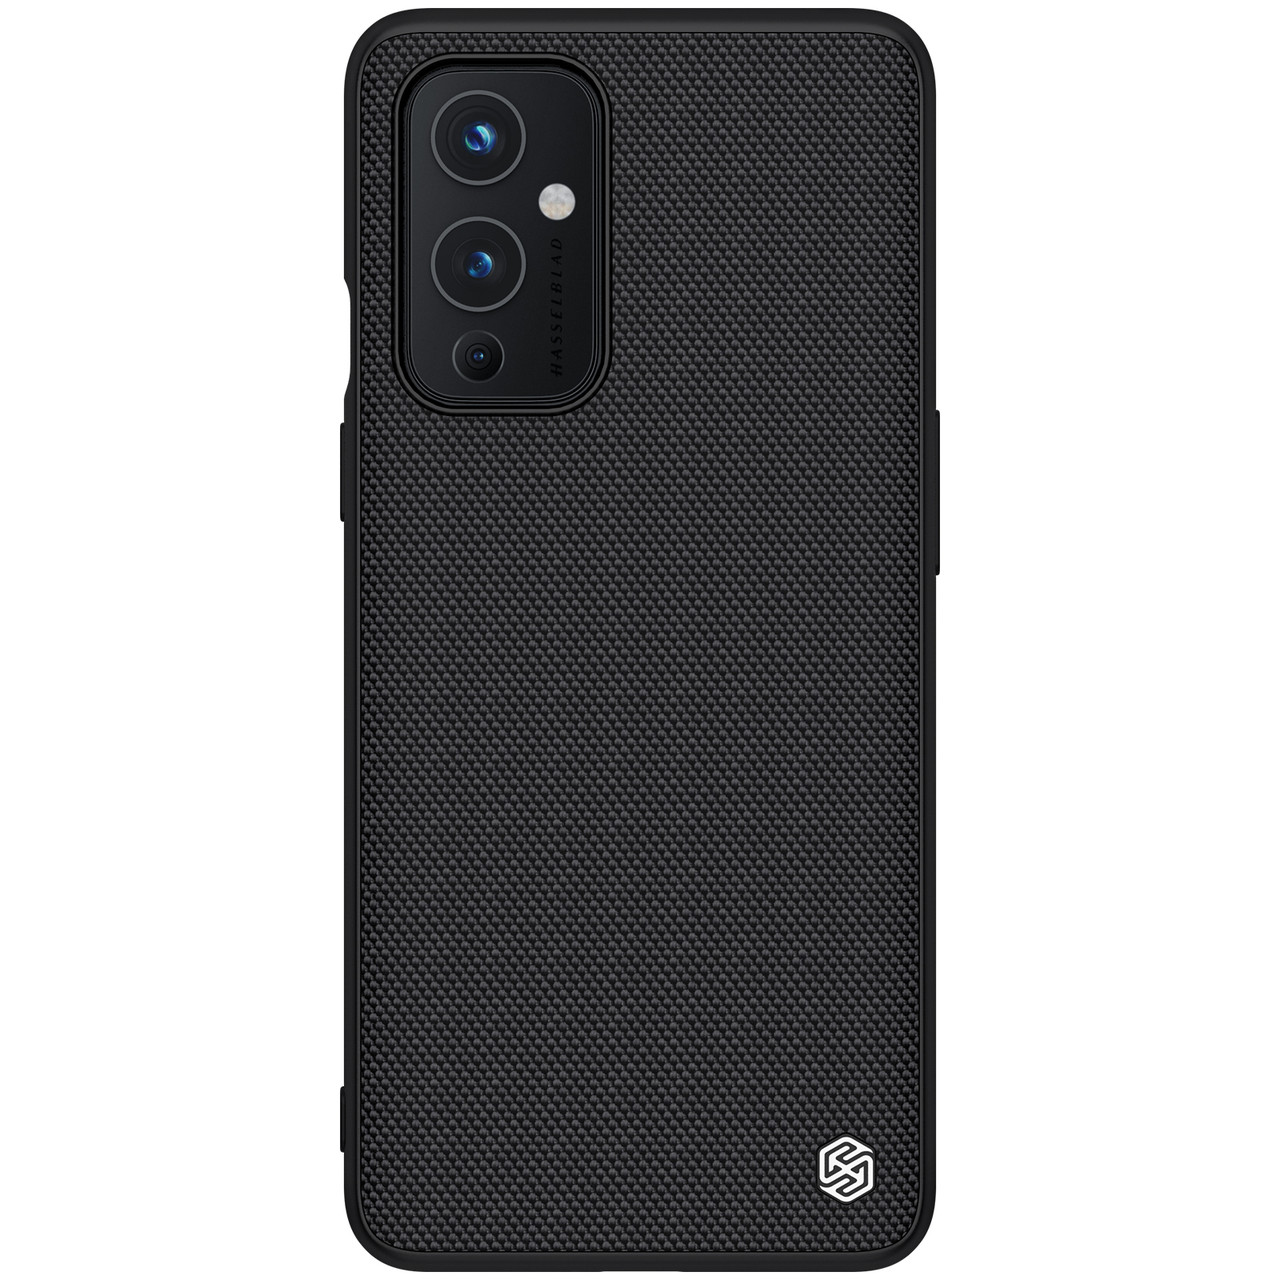 Захисний чохол Nillkin для OnePlus 9 (IN/CN) (Textured Case) Black Чорний